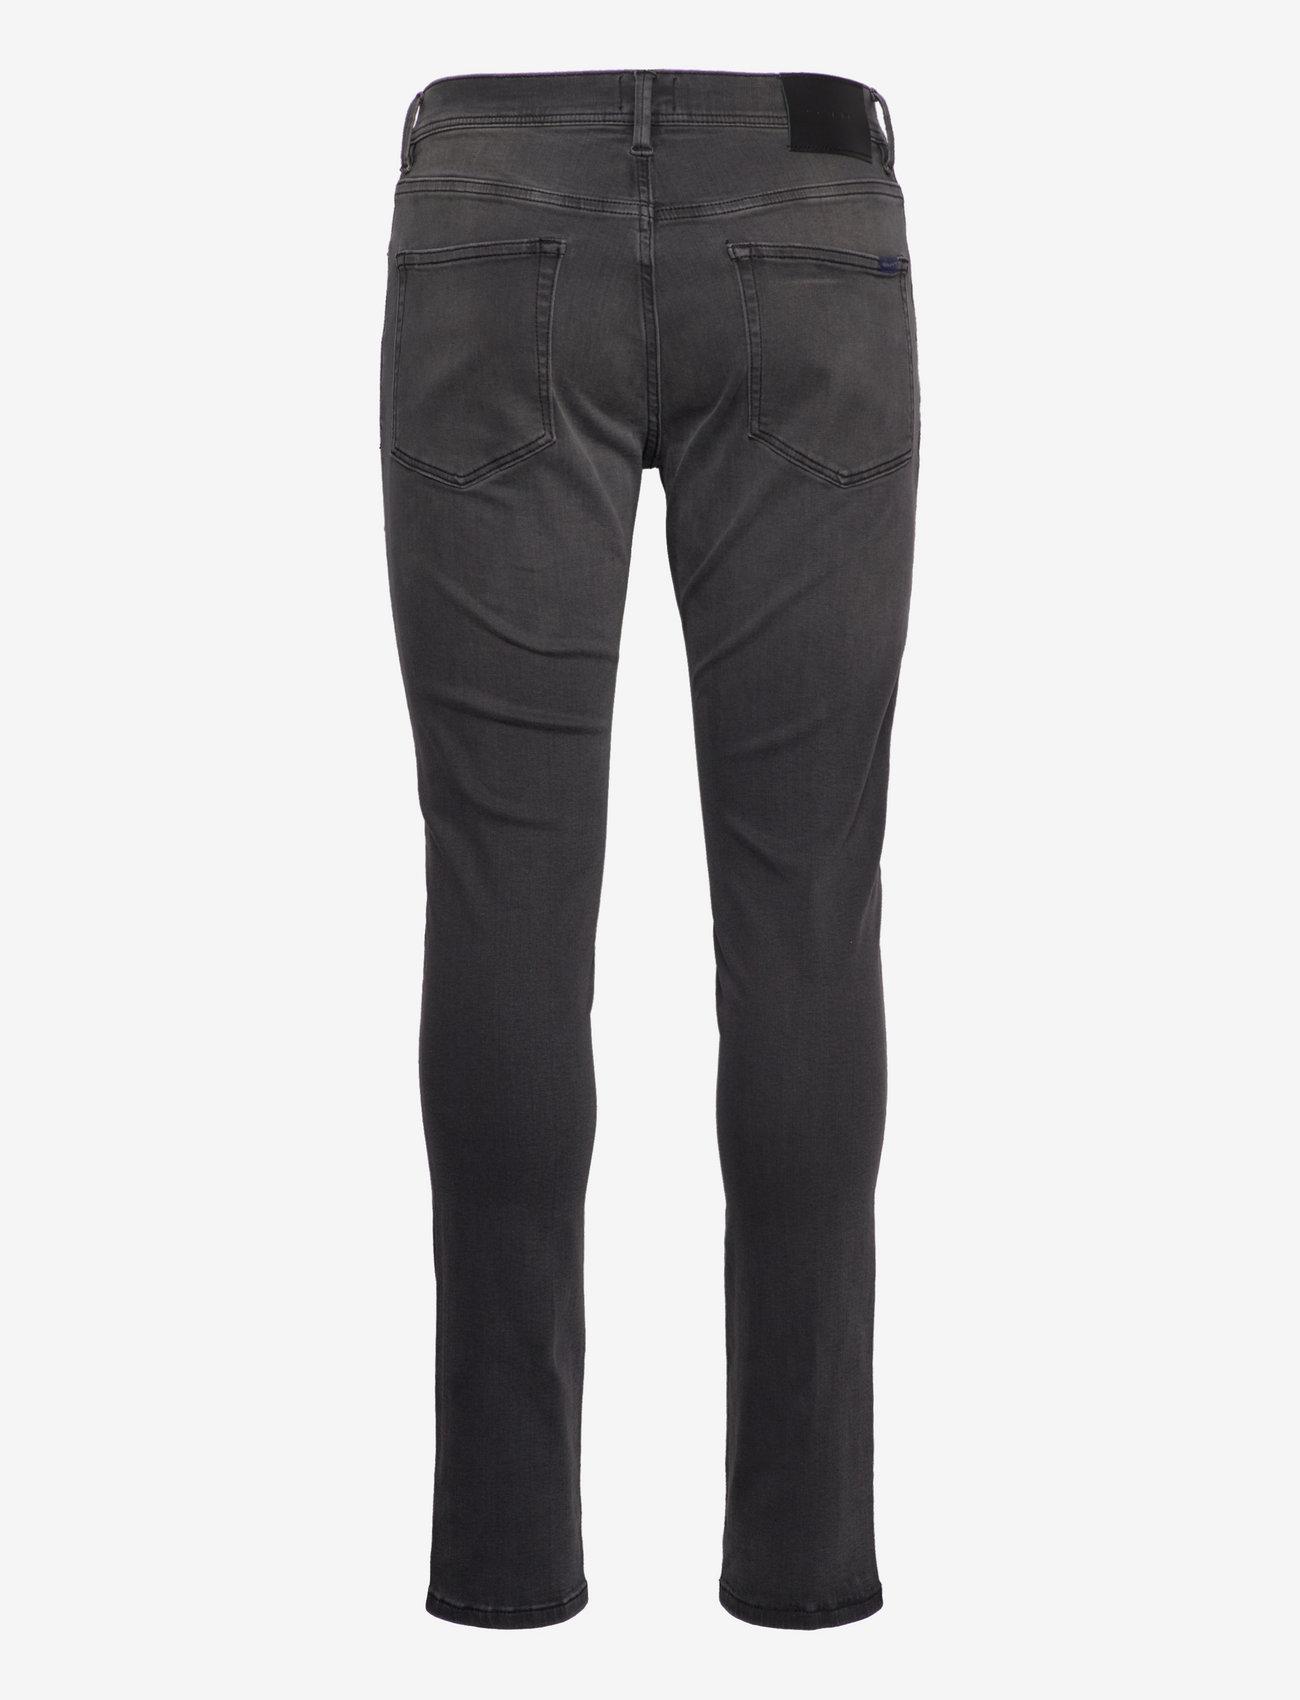 GANT D1. MAXEN ACTIVE-RECOVER BLK JEANS - Jeans BLACK WORN IN - Menn Klær